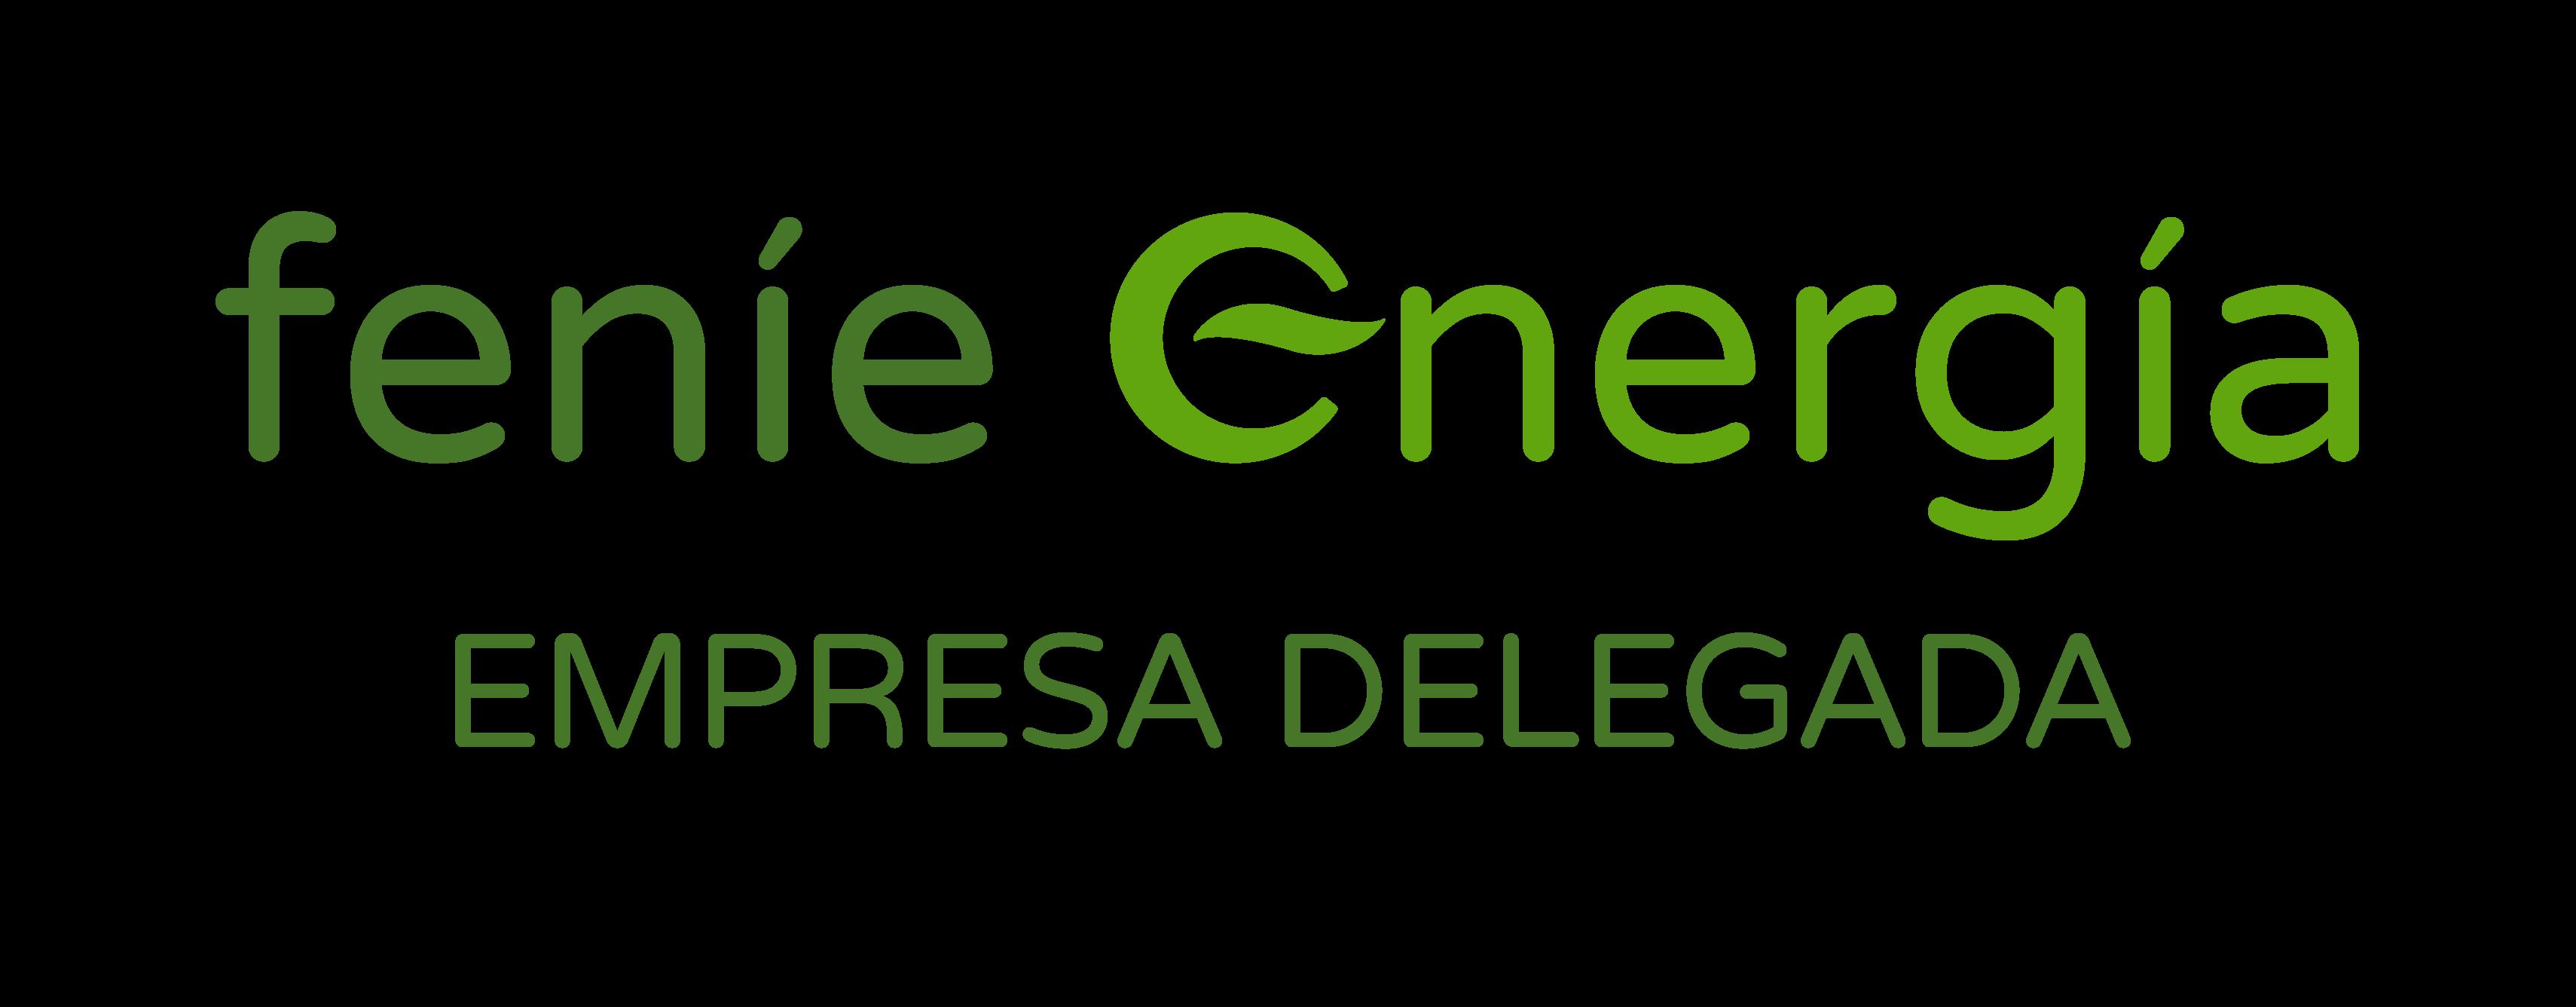 Empresa delegada en provincia  de Lleida